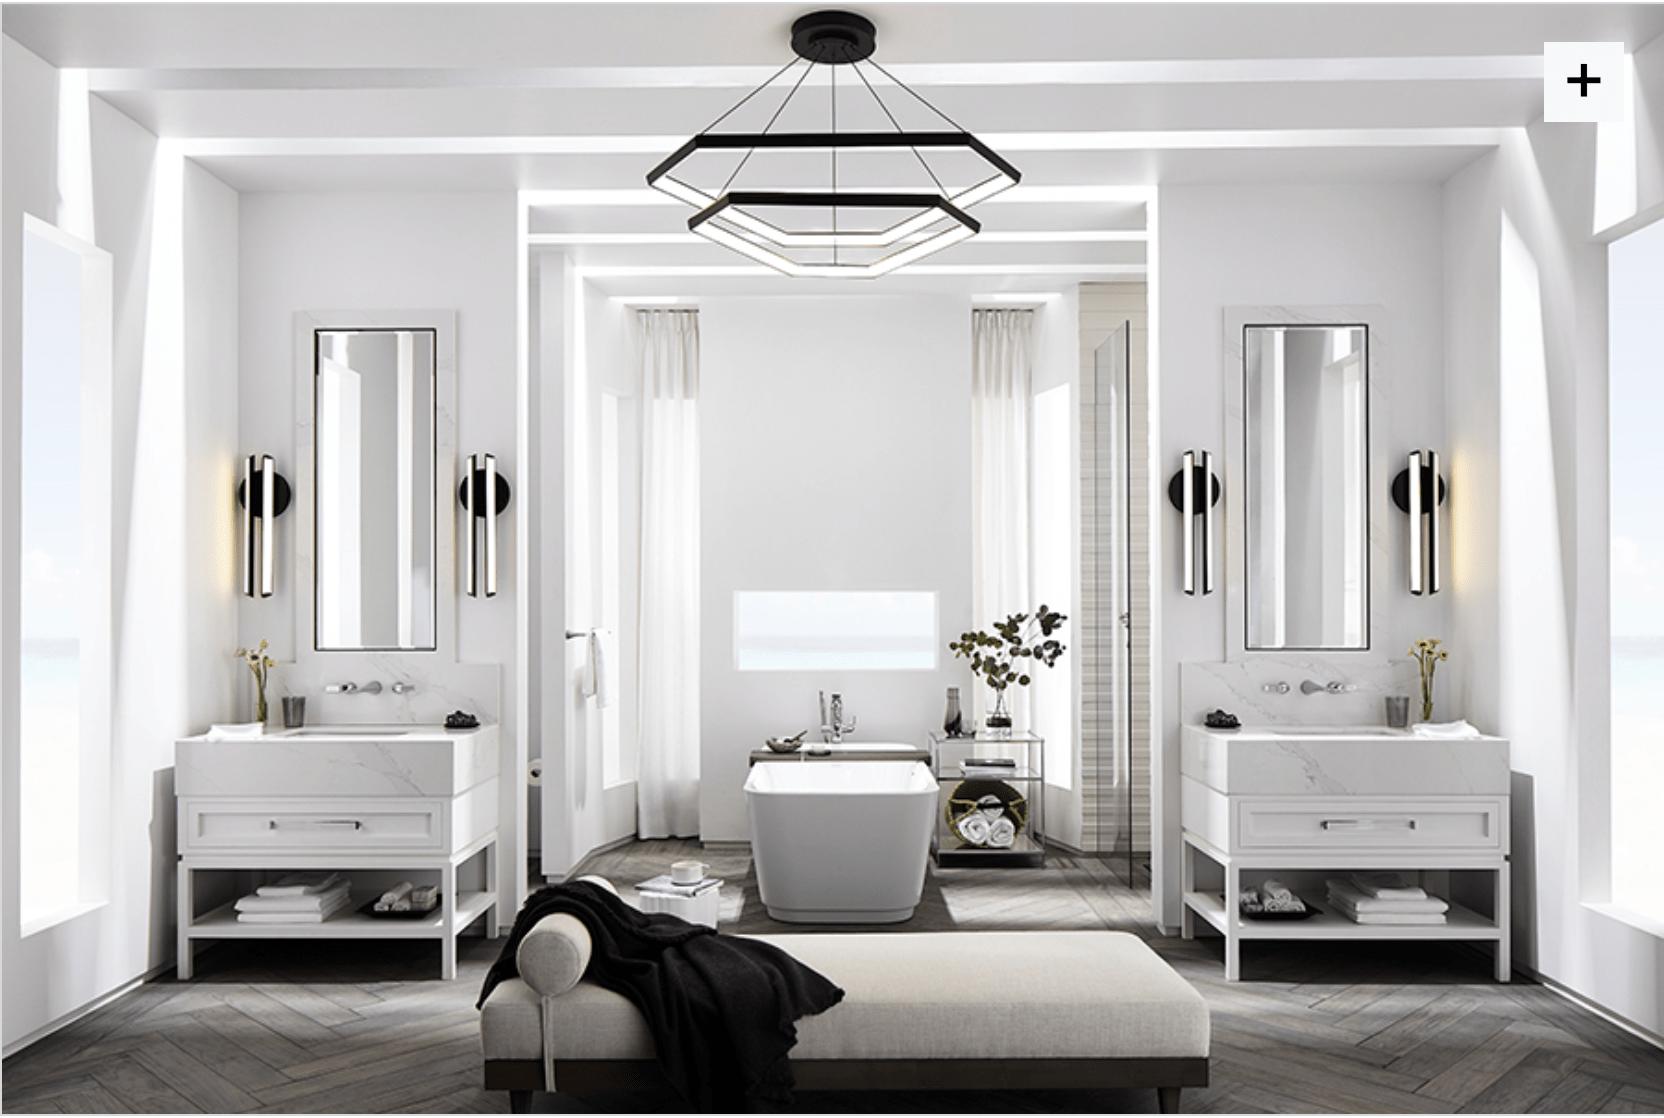 A stunning bathroom designed by Laura Muller of www.fourpointdesignbuild.com for luxury bathroom brand, DXV